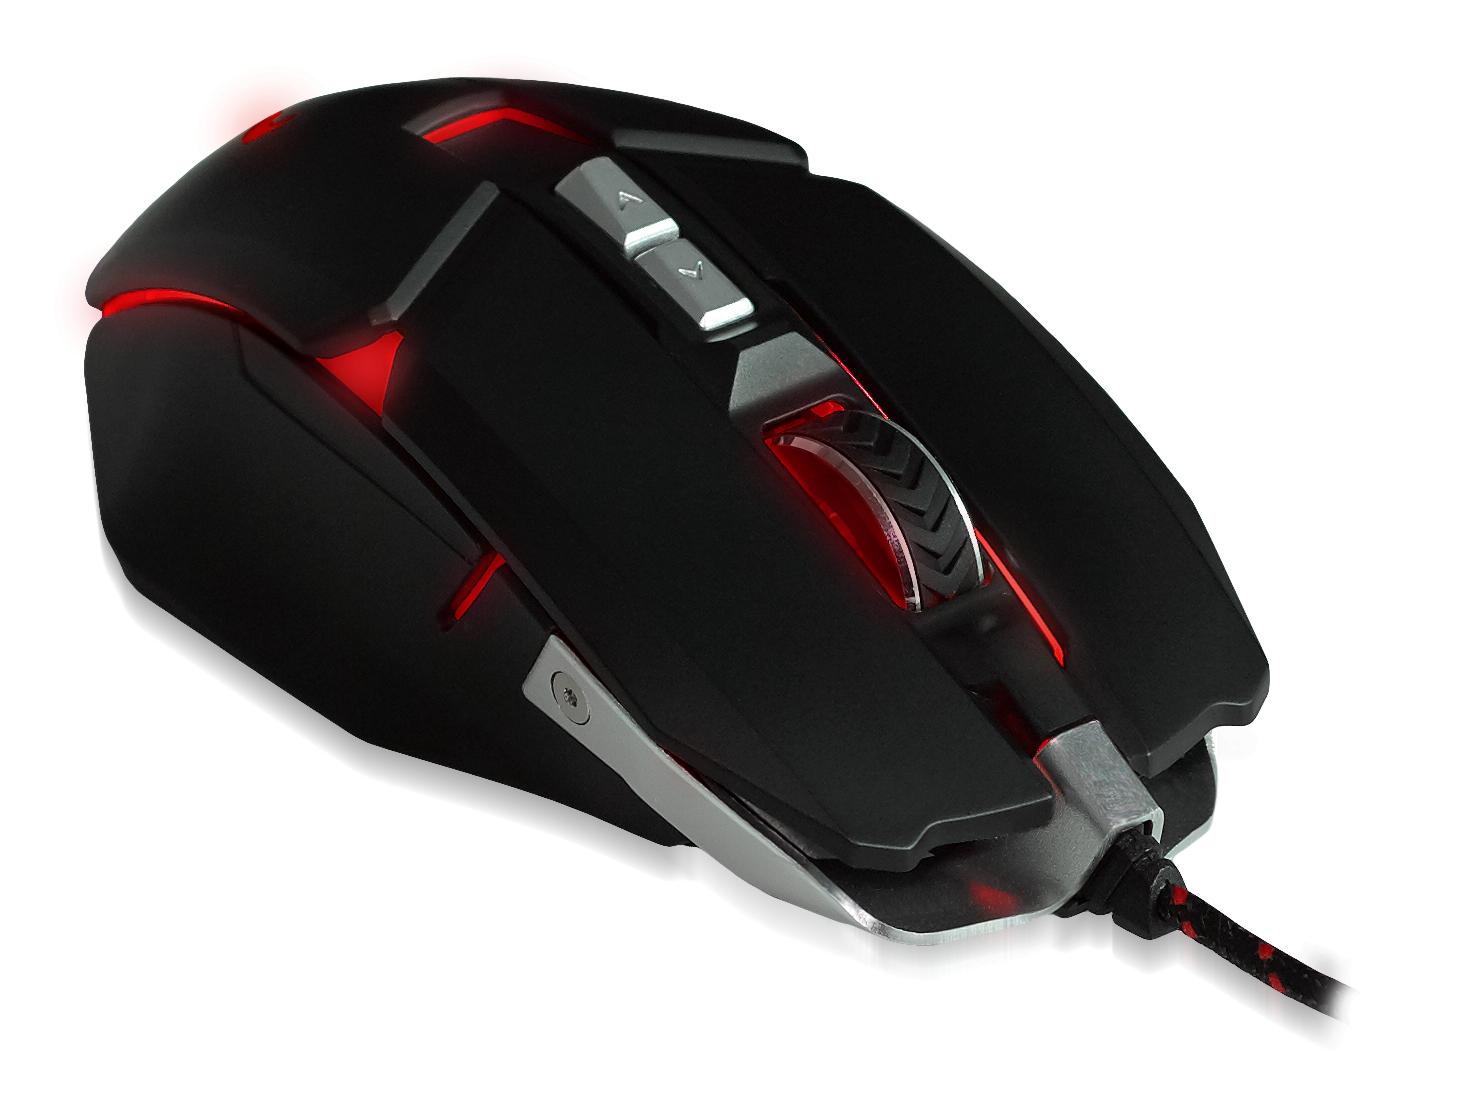 riotoro-2017-computex-mouseblack.png